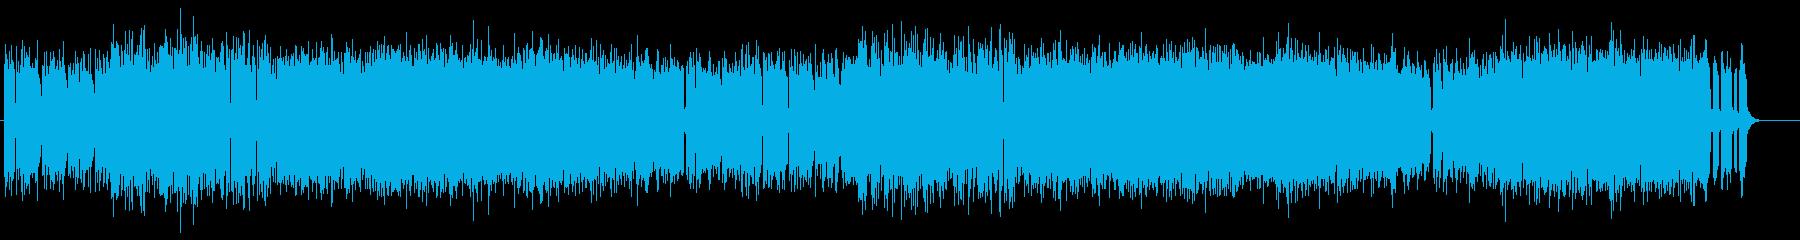 「HR/HM」「DARK」BGM309の再生済みの波形